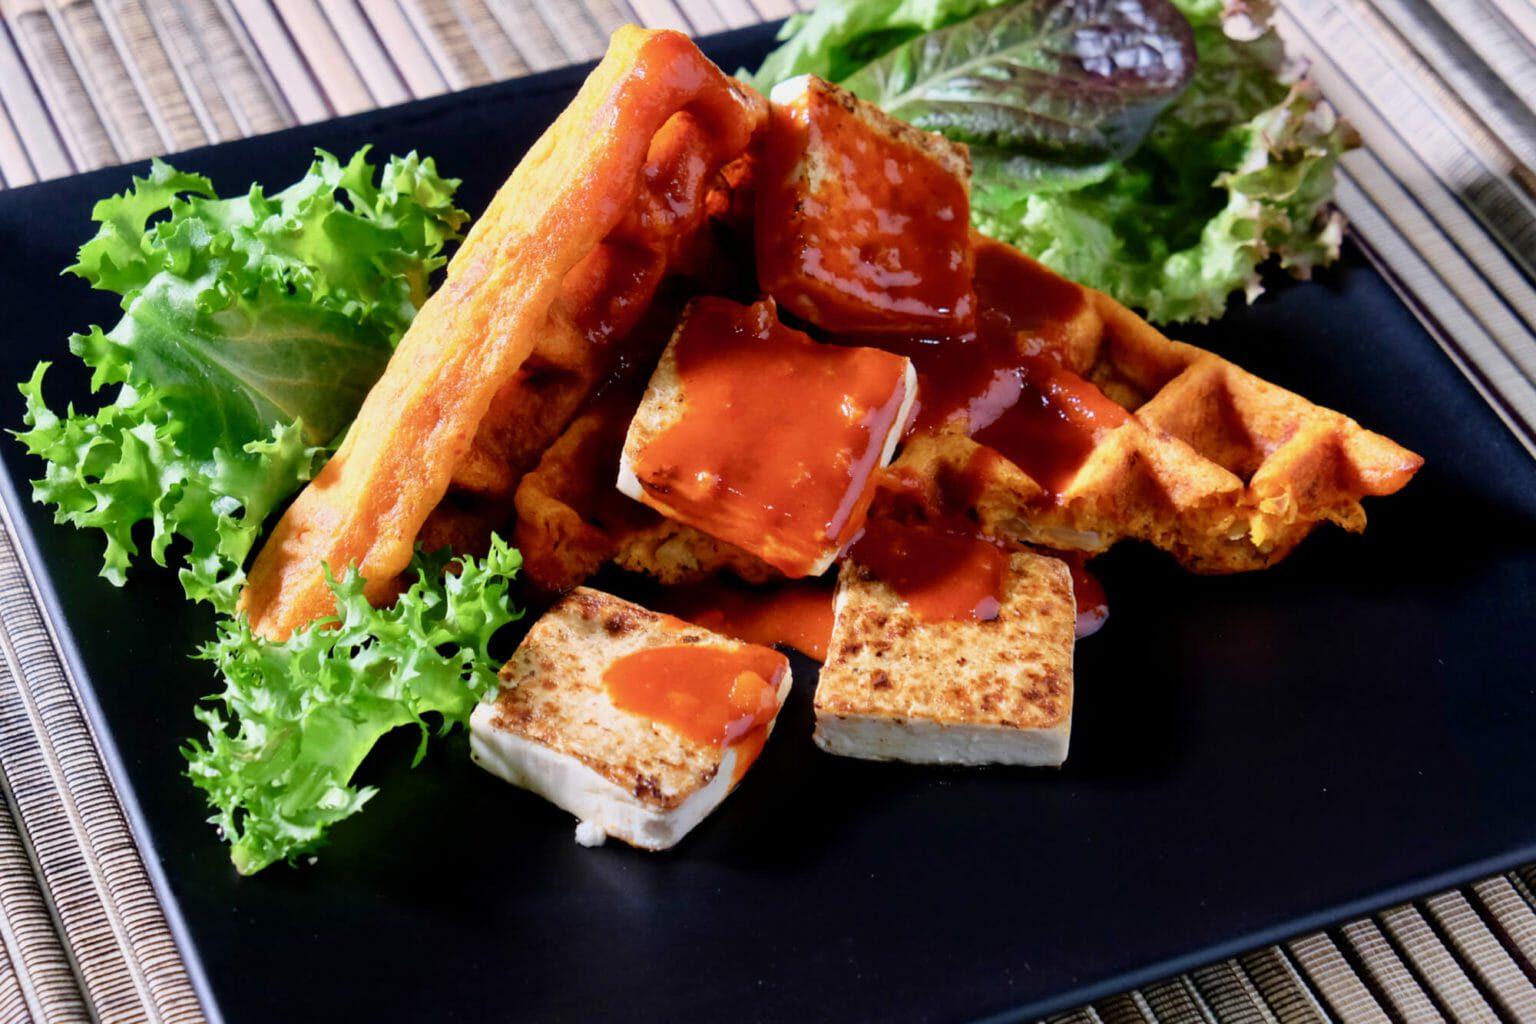 kimchi-jeon-pancakes-waffles-gochujang-sauce